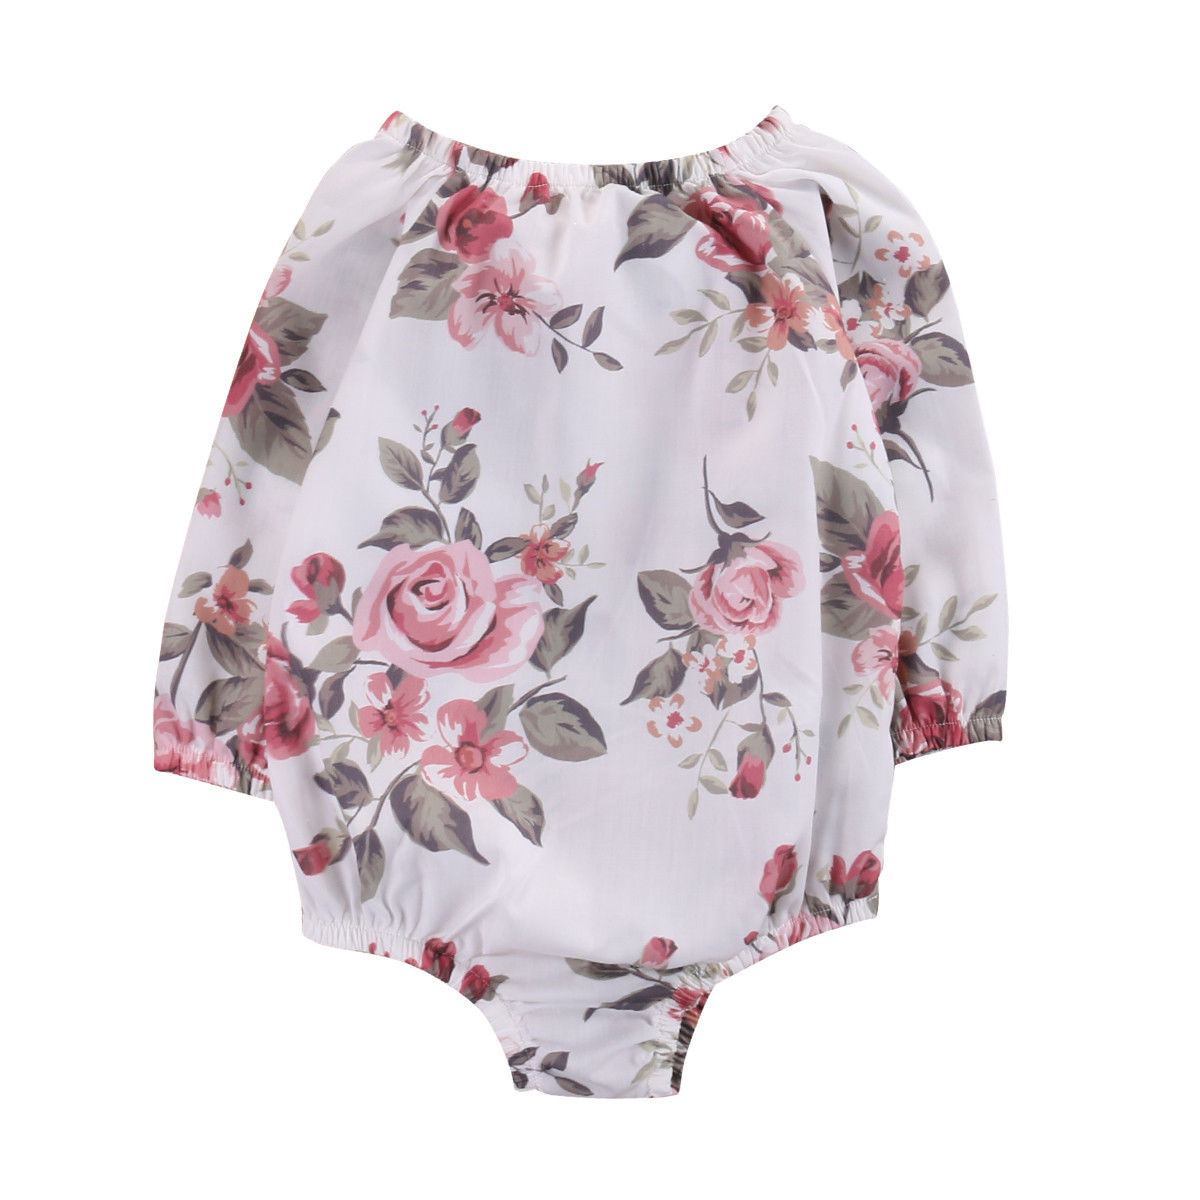 Flower T-Shirt Floral Toddler Baby-Girl Bodysuit Infant Newborn 0-24M Outfit-Set